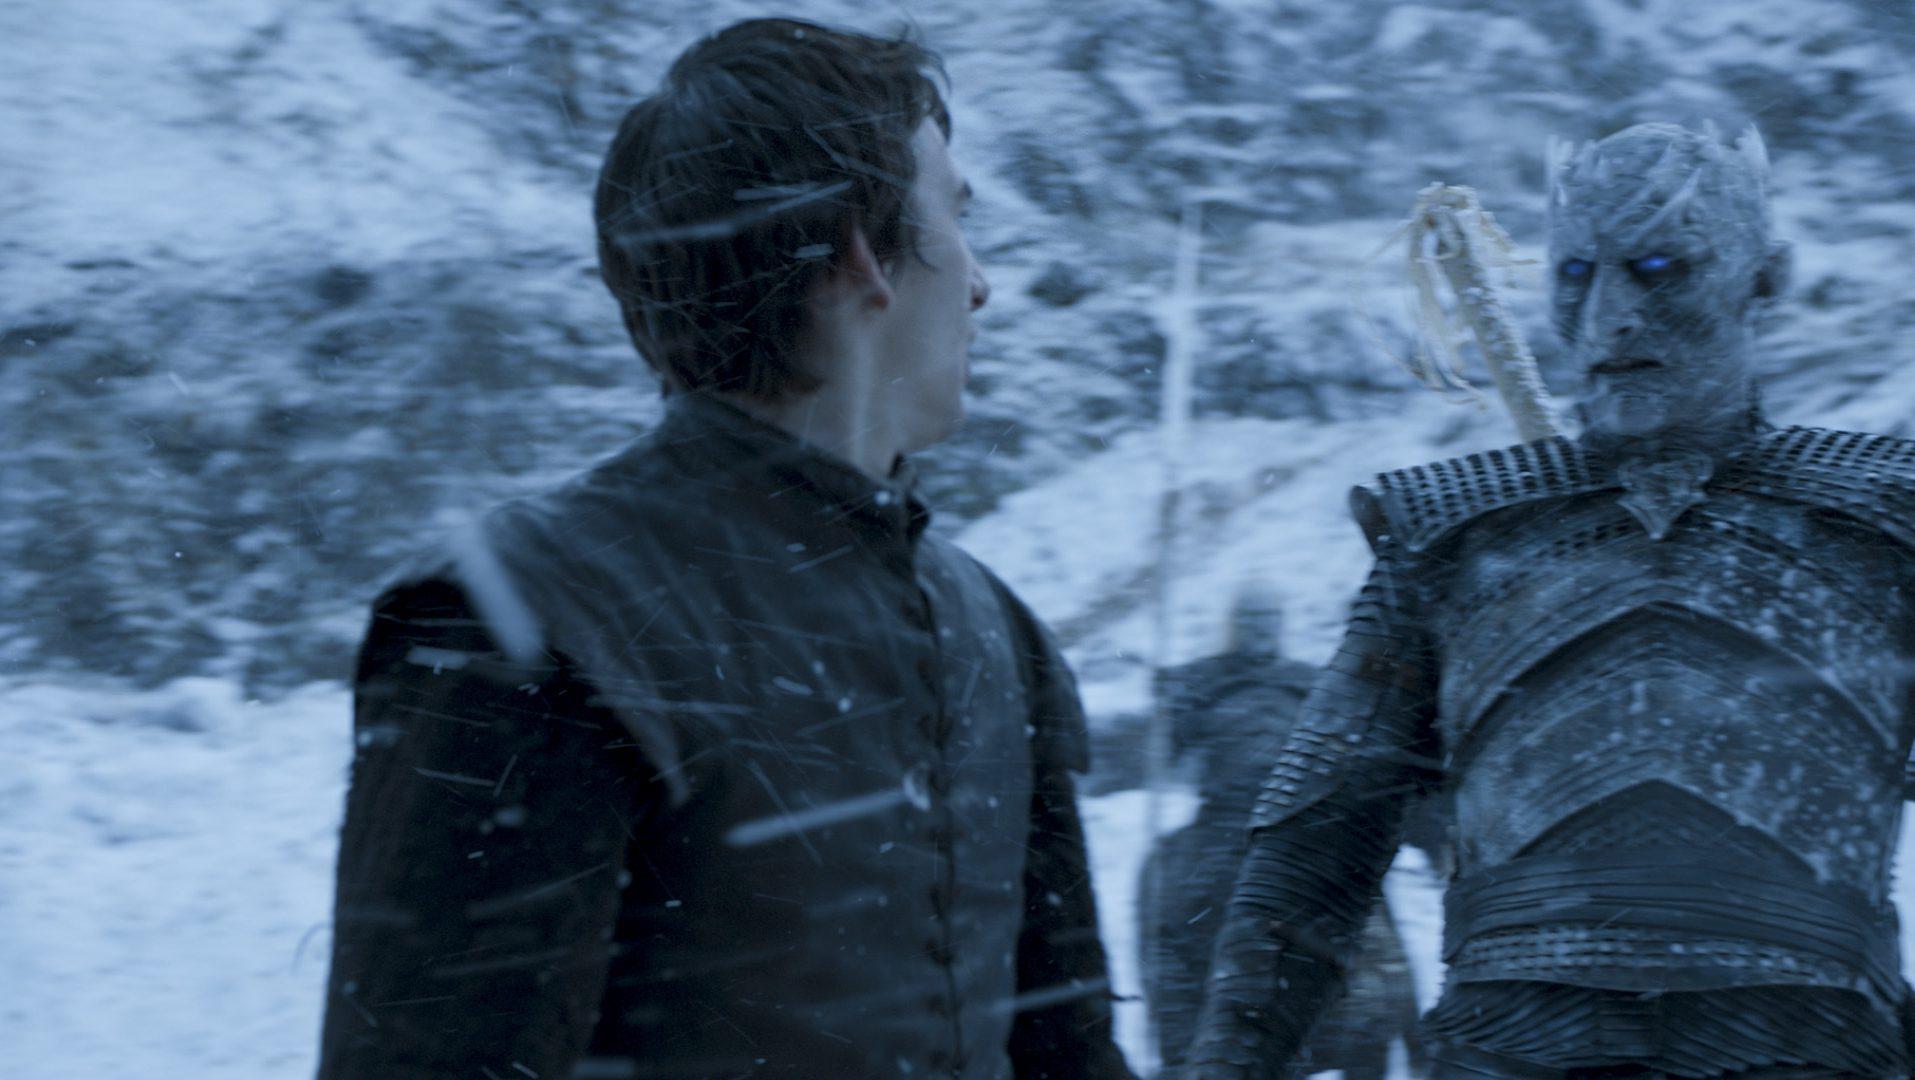 hbo game of thrones white walker